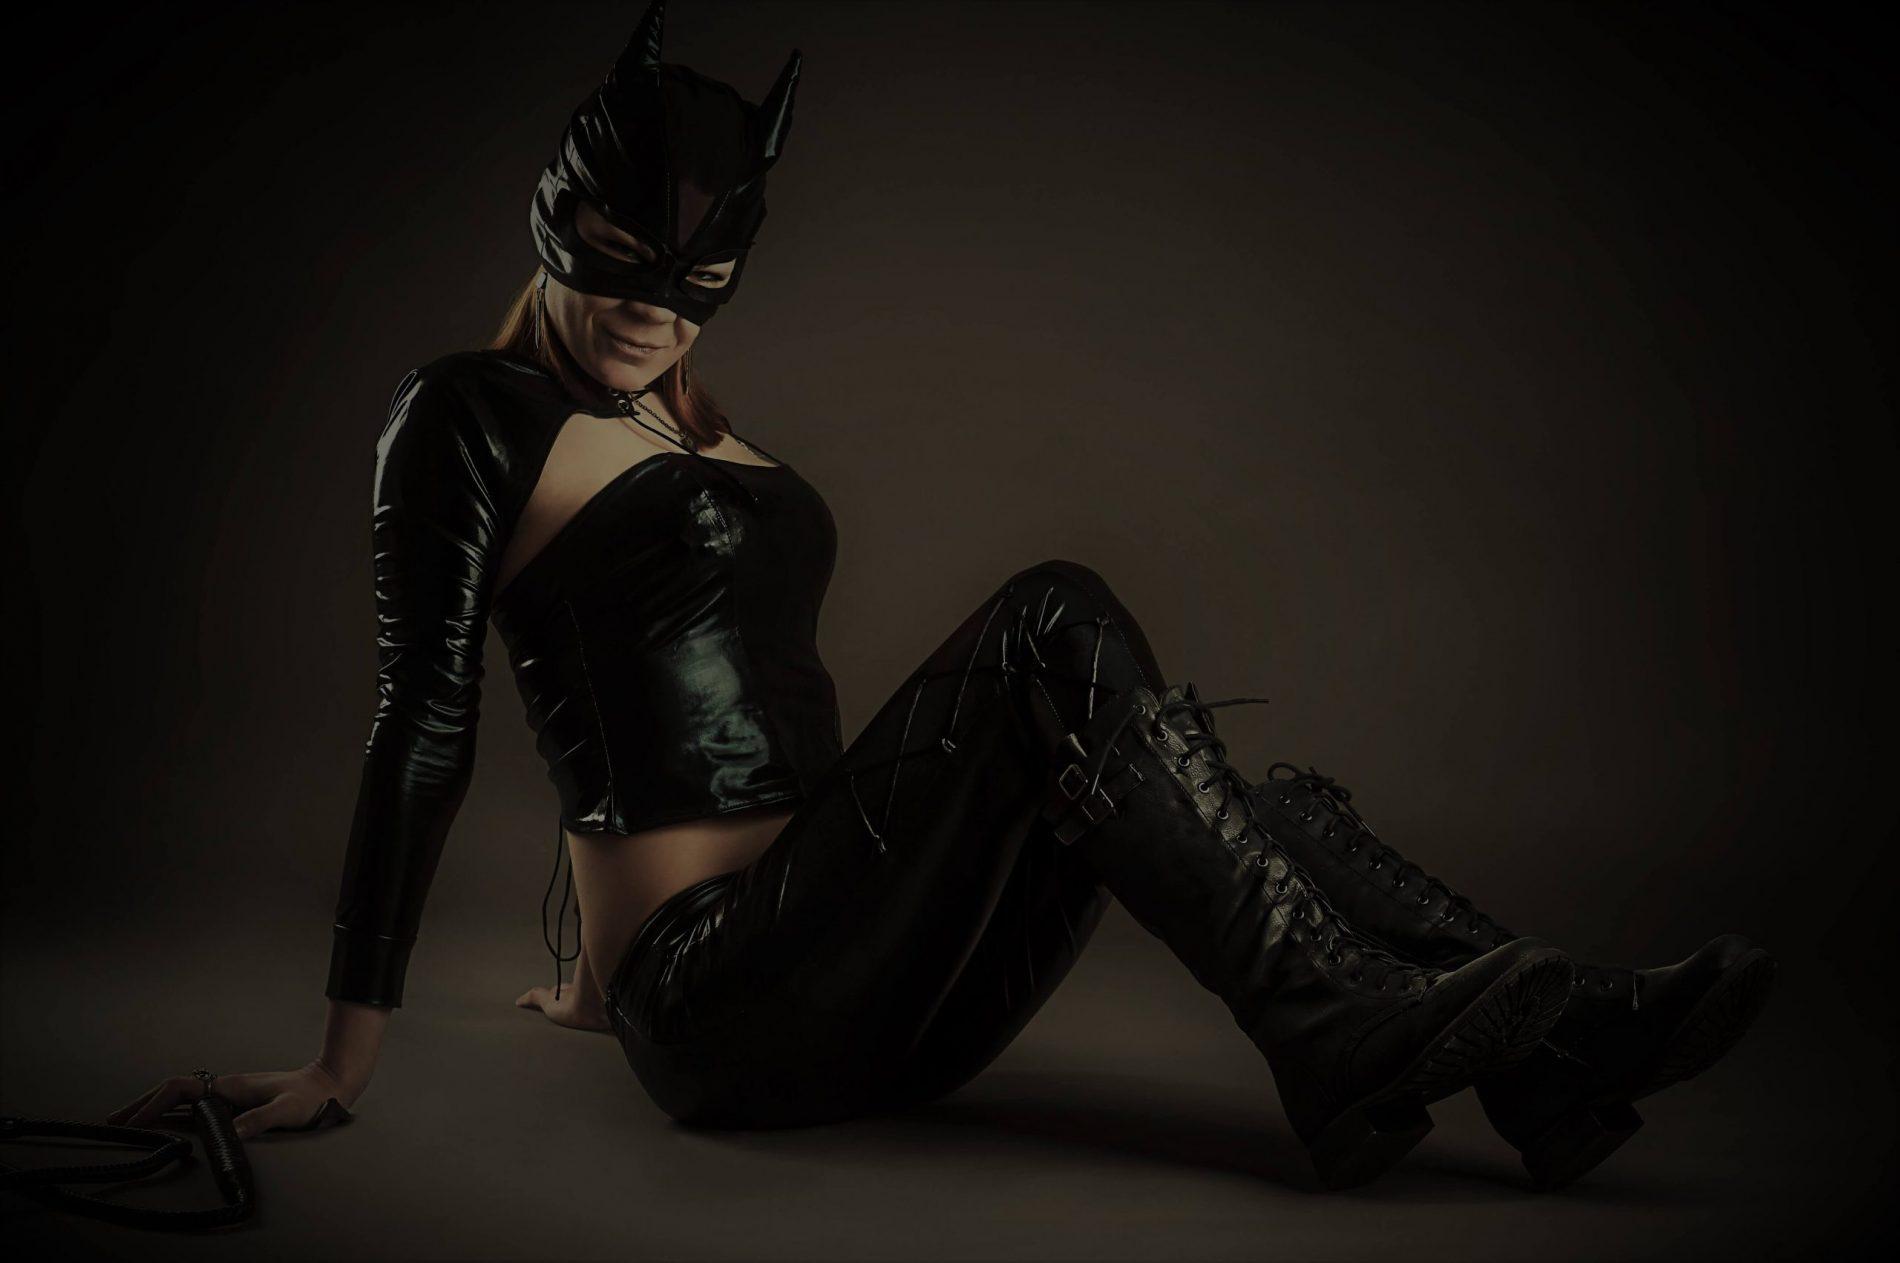 Sexy Cat women Pics